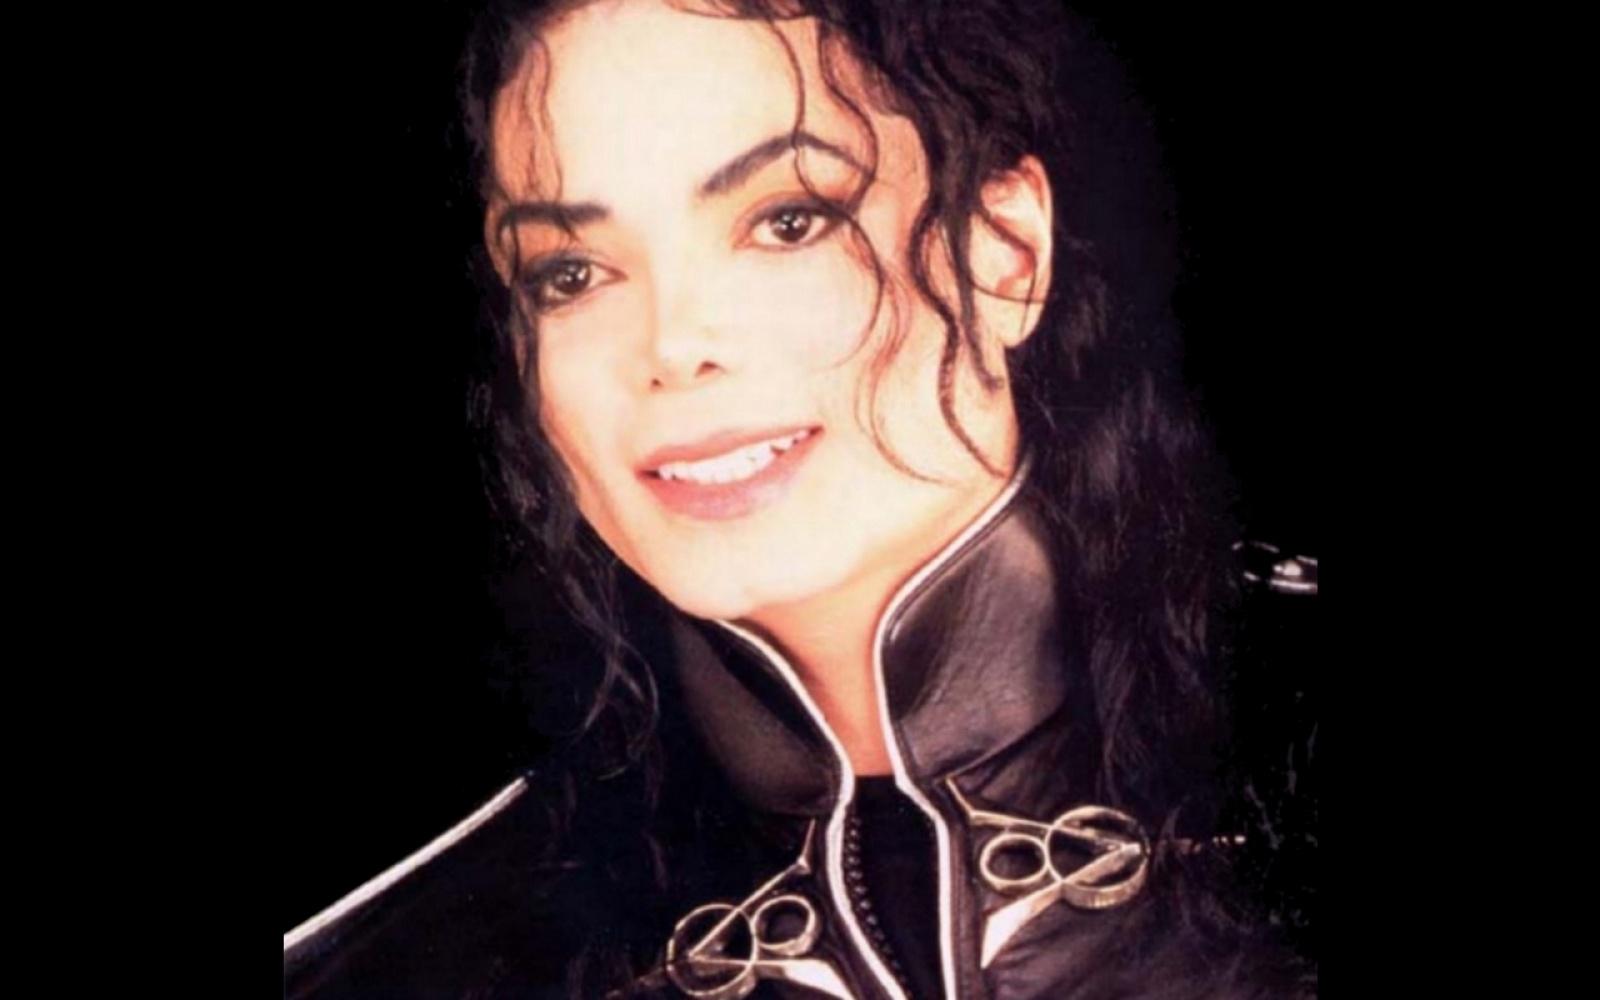 http://4.bp.blogspot.com/-c1lpTLaoRHM/UFISYC4fCQI/AAAAAAAAAc0/WTVn-lPvyi0/s1600/ws_Michael_Jackson_1600x1200.jpg